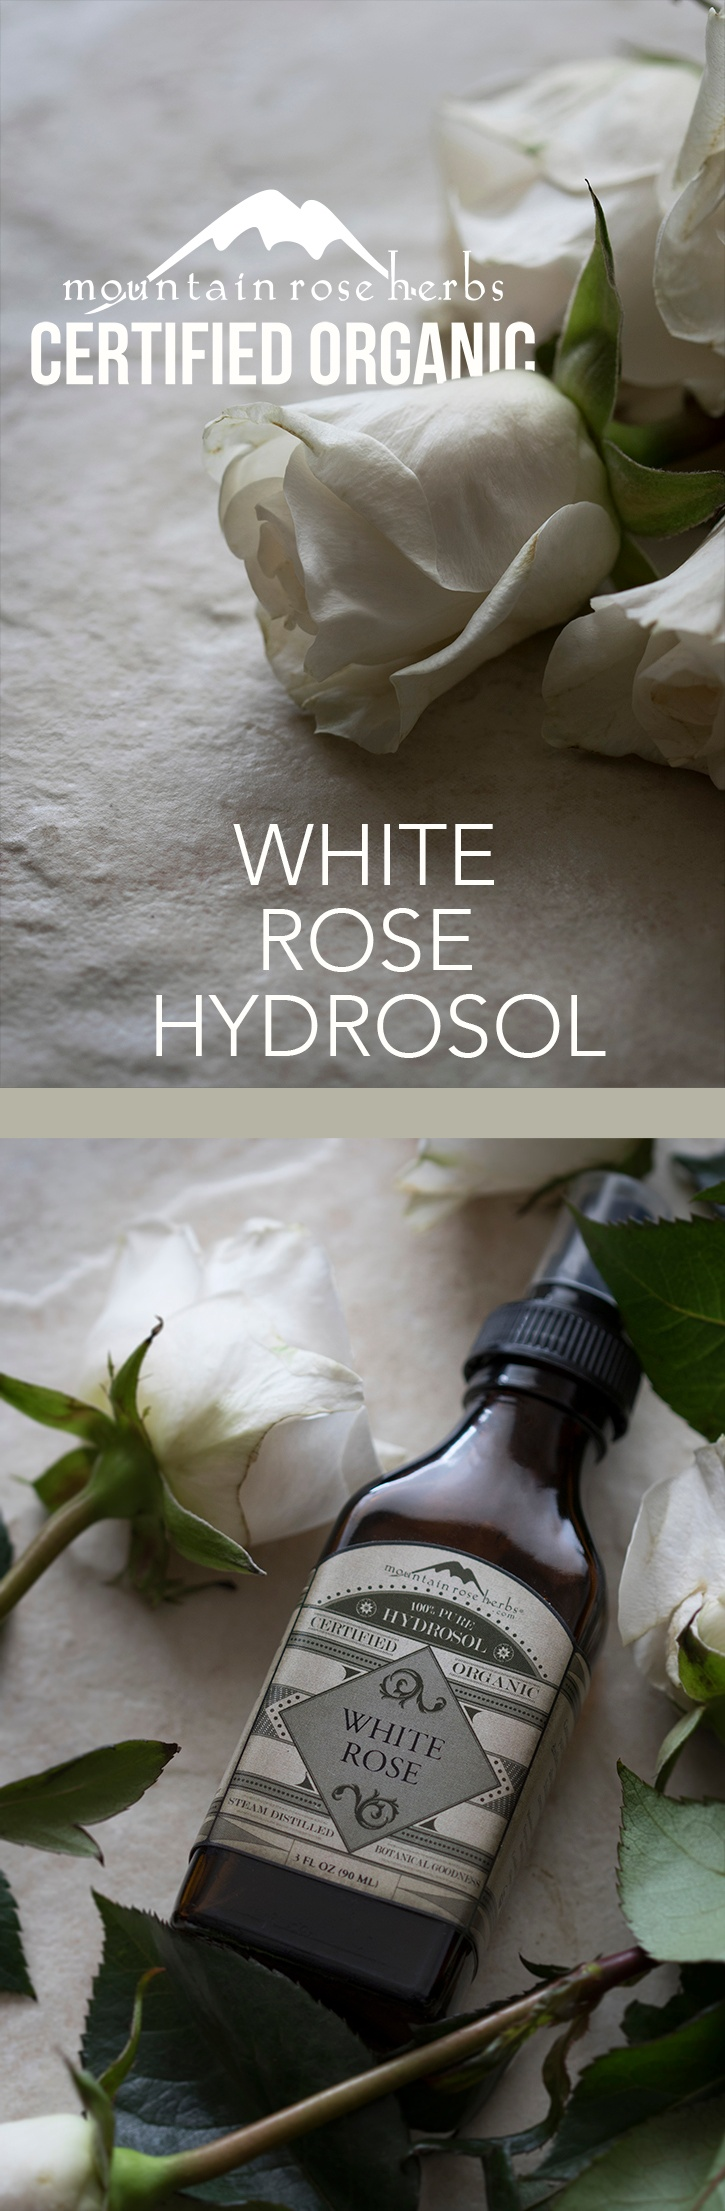 whiterosehydrosol_pinterest